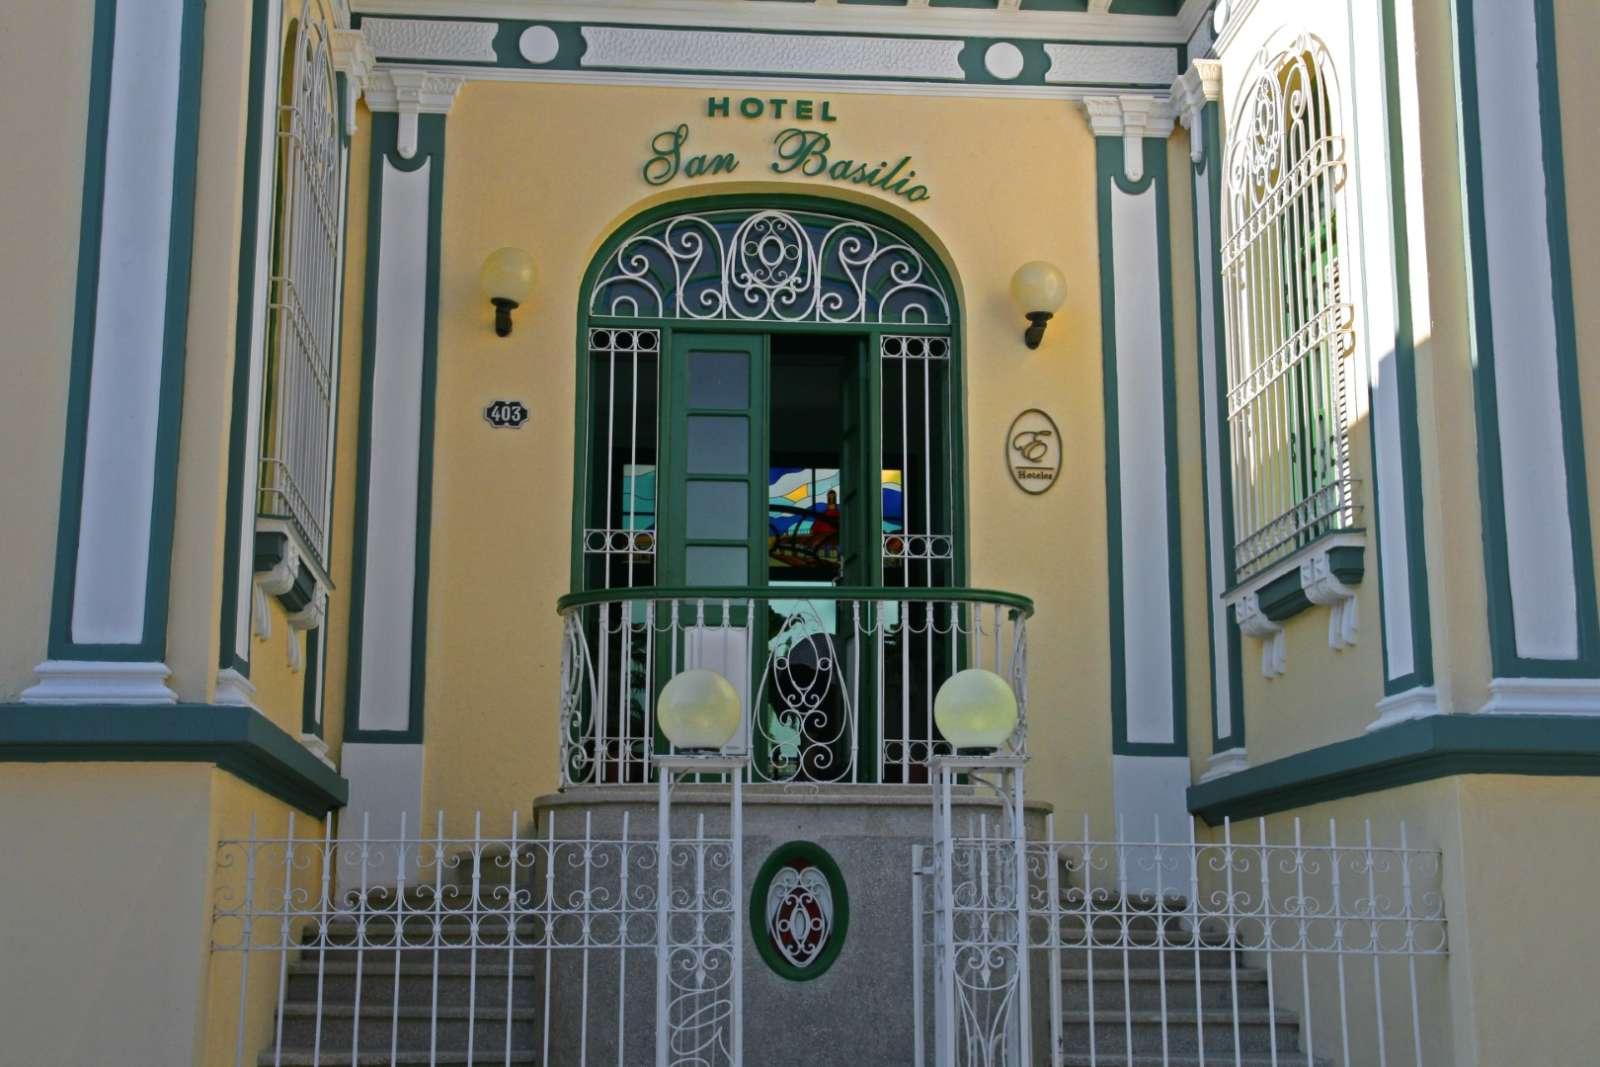 Entrance gate to Hotel San Basilio